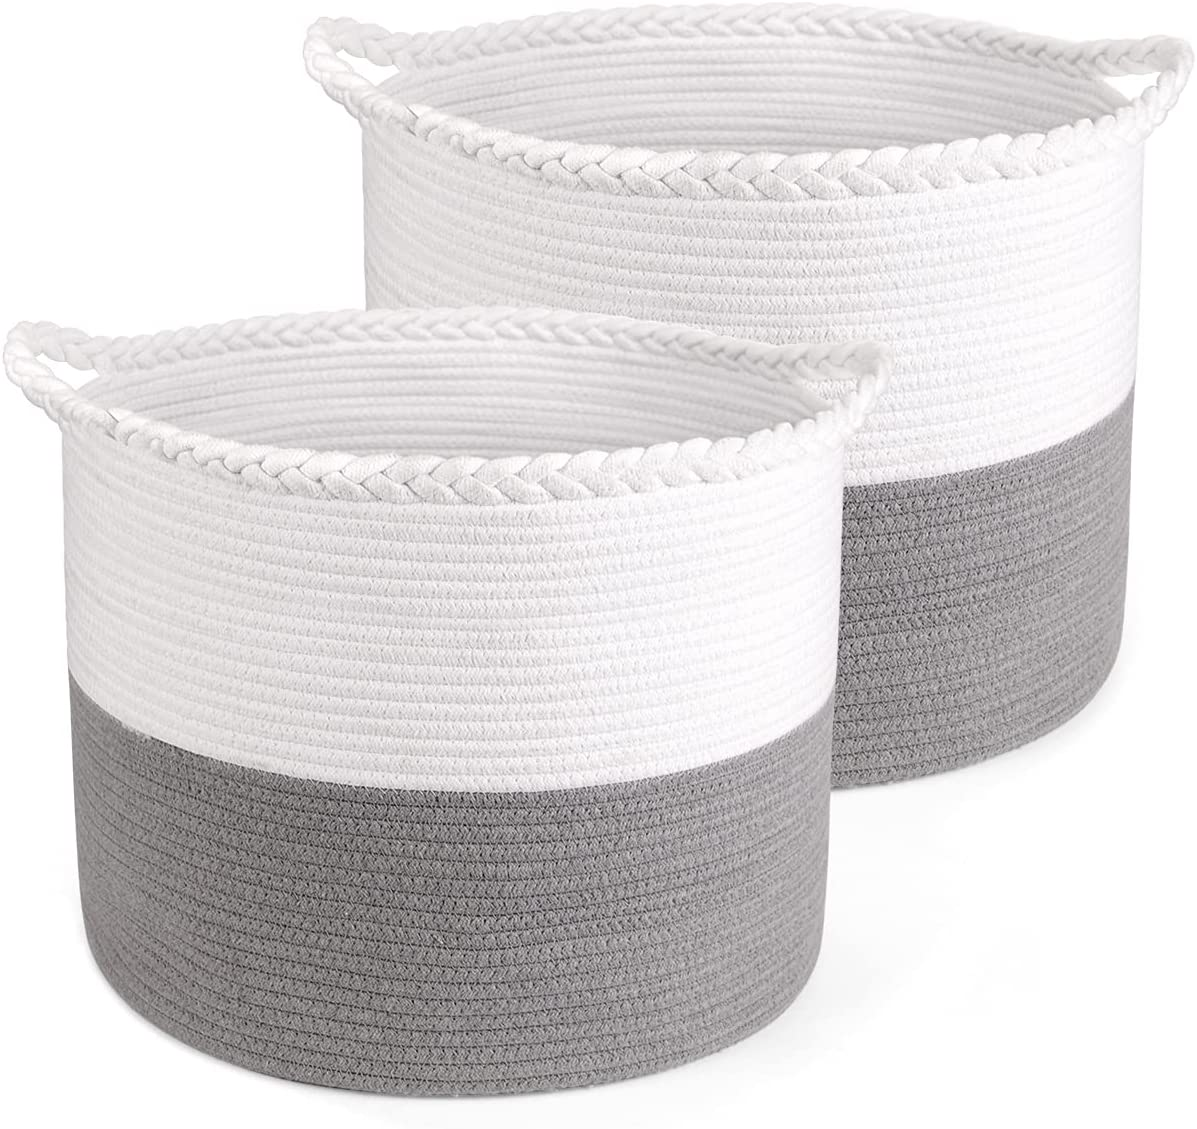 BAIST 18 x 14'' Large Cotton free Rope Laundry Storage Max 68% OFF Wo Basket